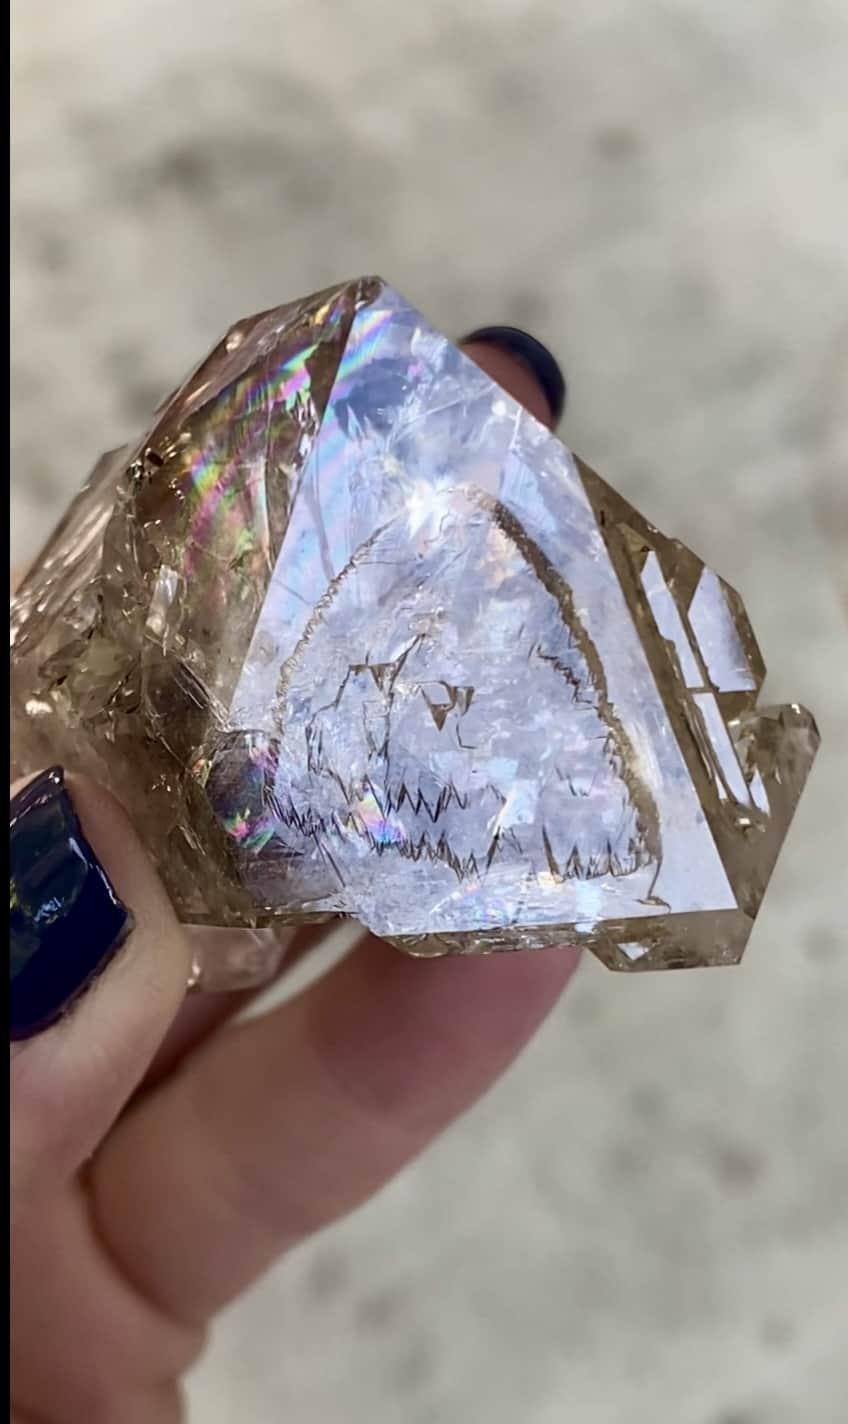 Skeletal record keeper herkimer crystal